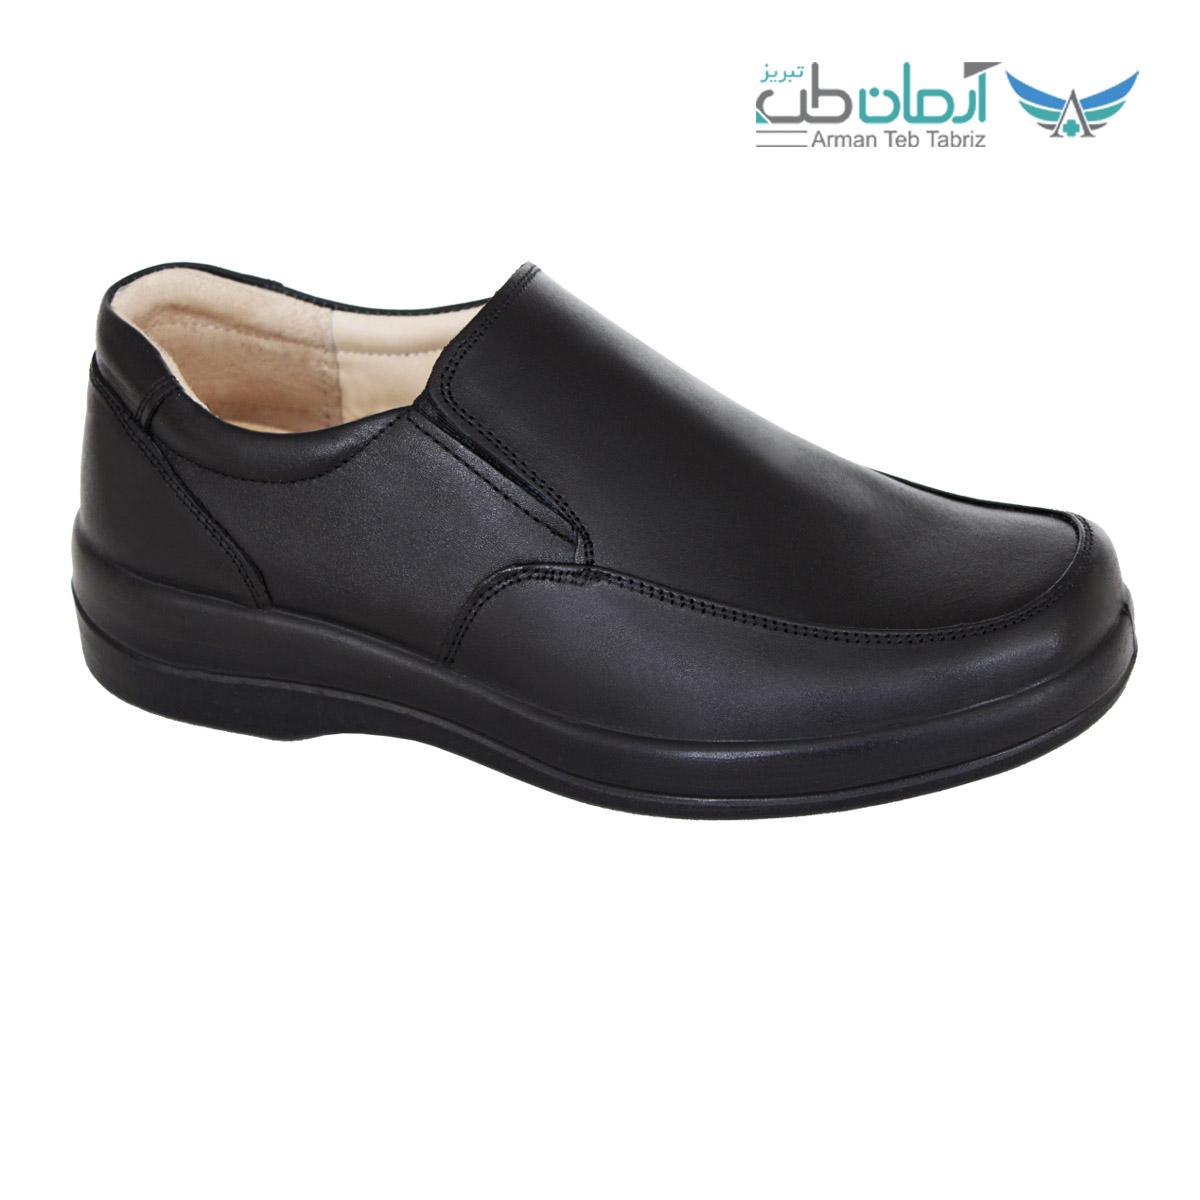 کفش مردانه پرسنلی